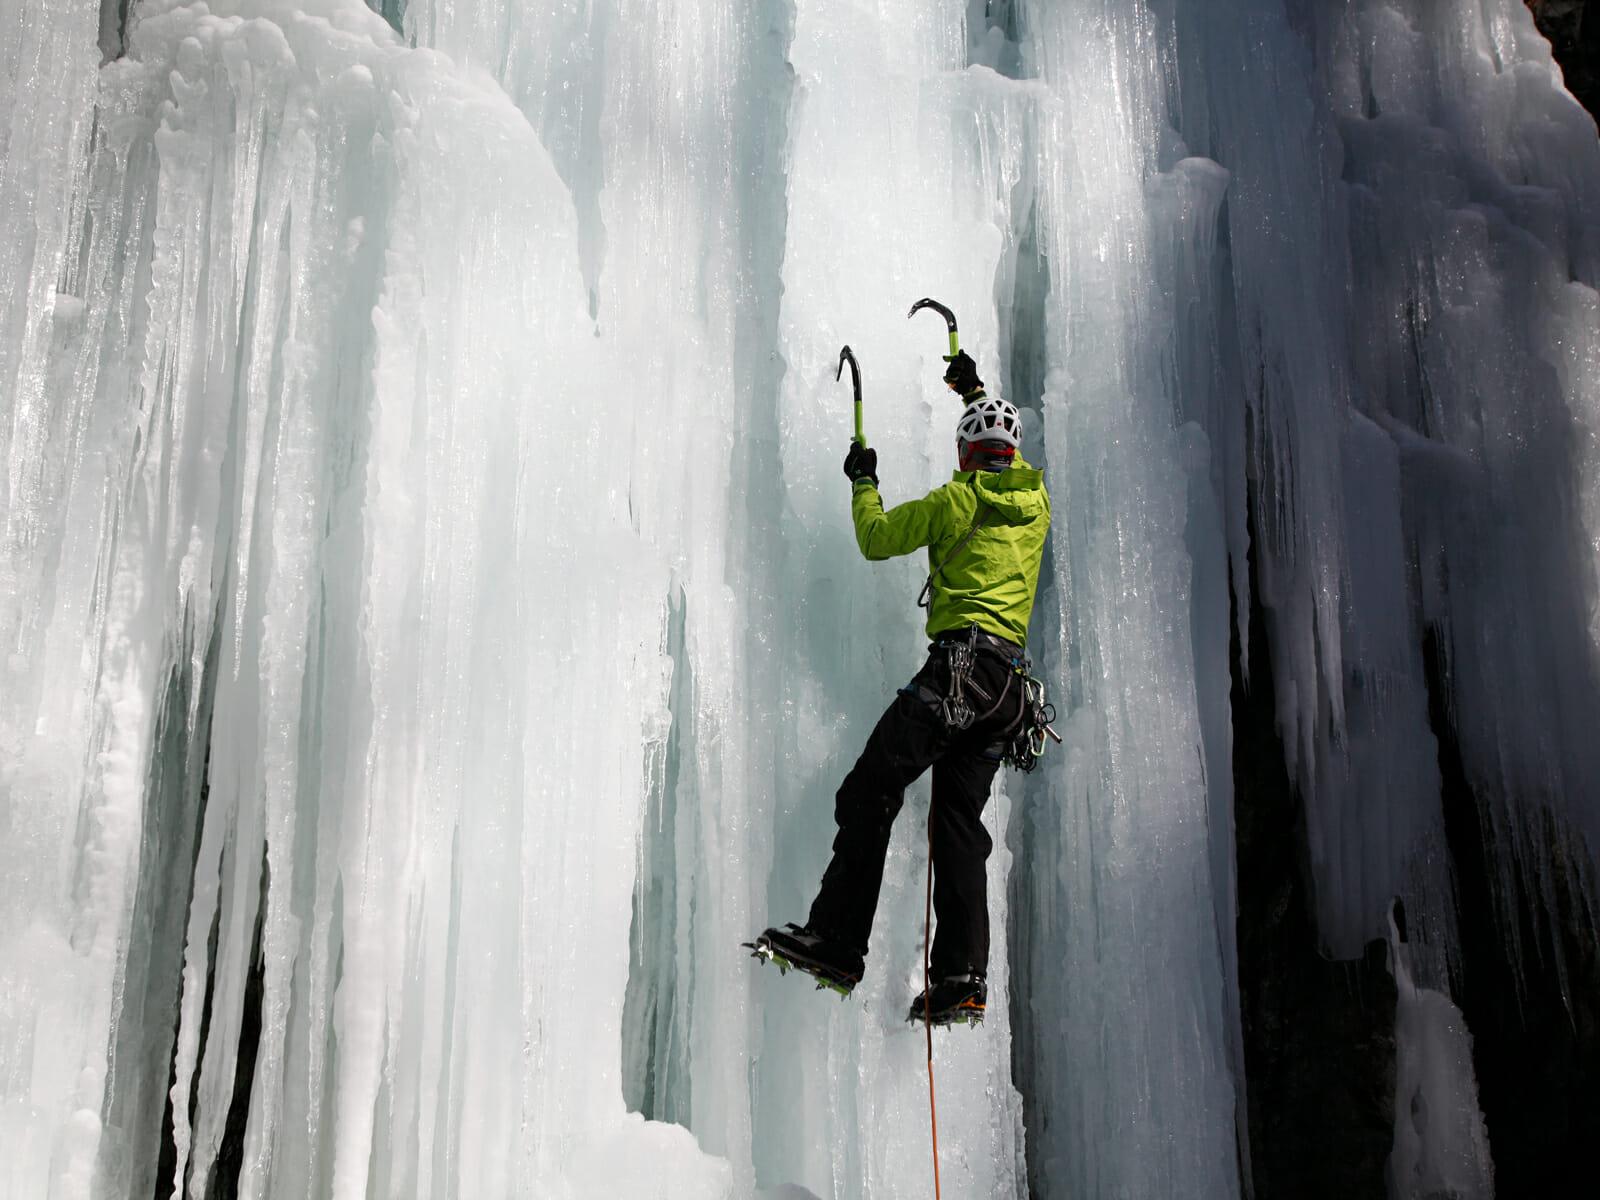 Klettergurt Eisklettern : Eisklettern schnupperkurs pontresina bergsteigerschule